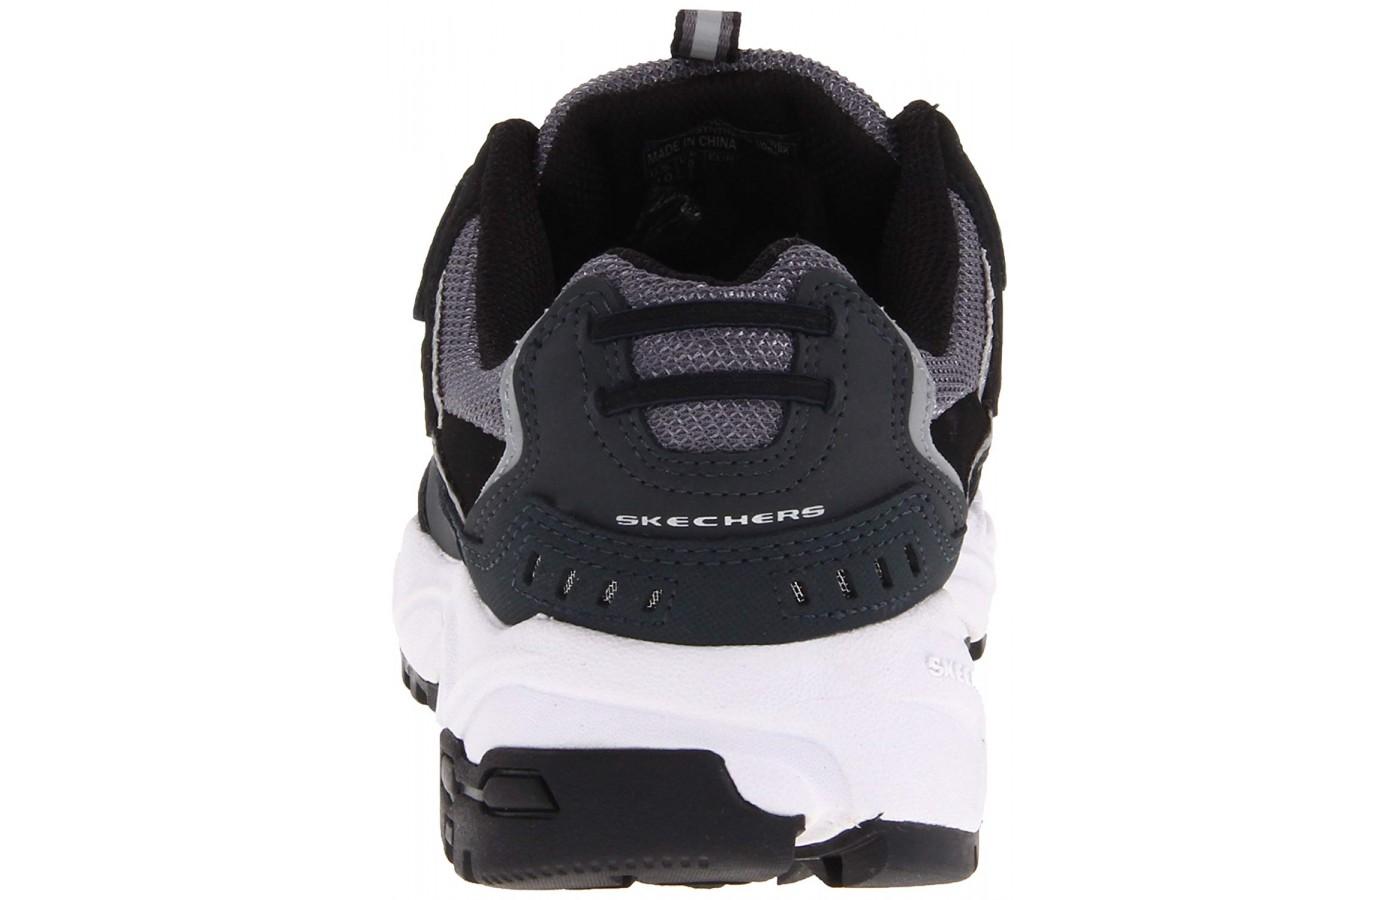 Skechers Sport Stamina Nuovo Heel